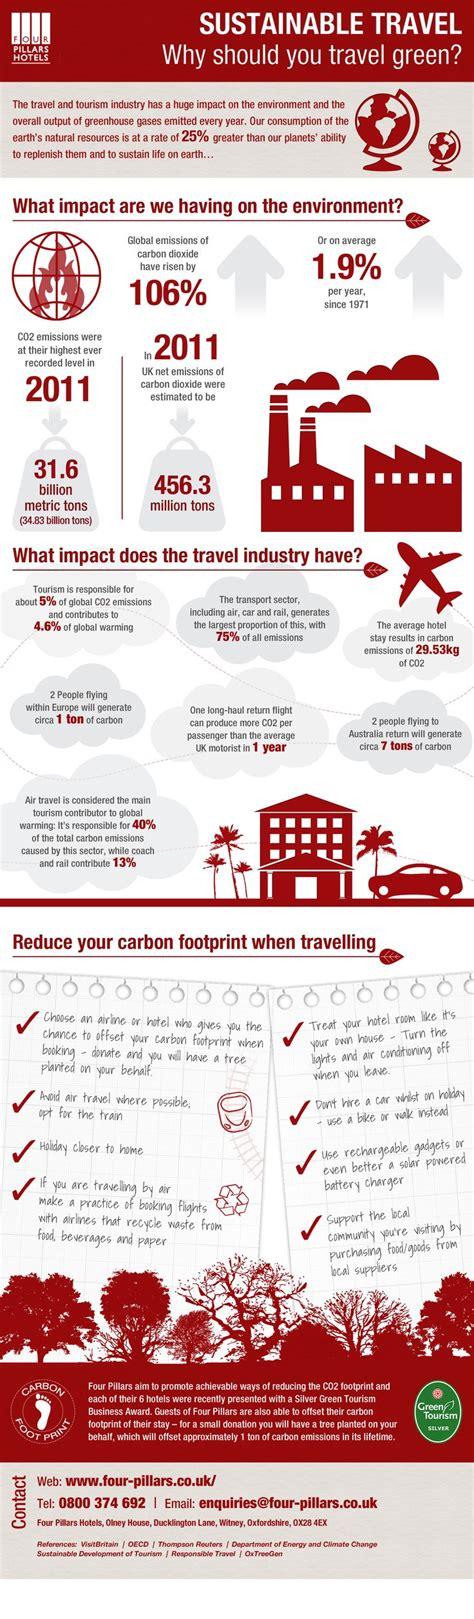 Carbon Footprint Worksheet Answers